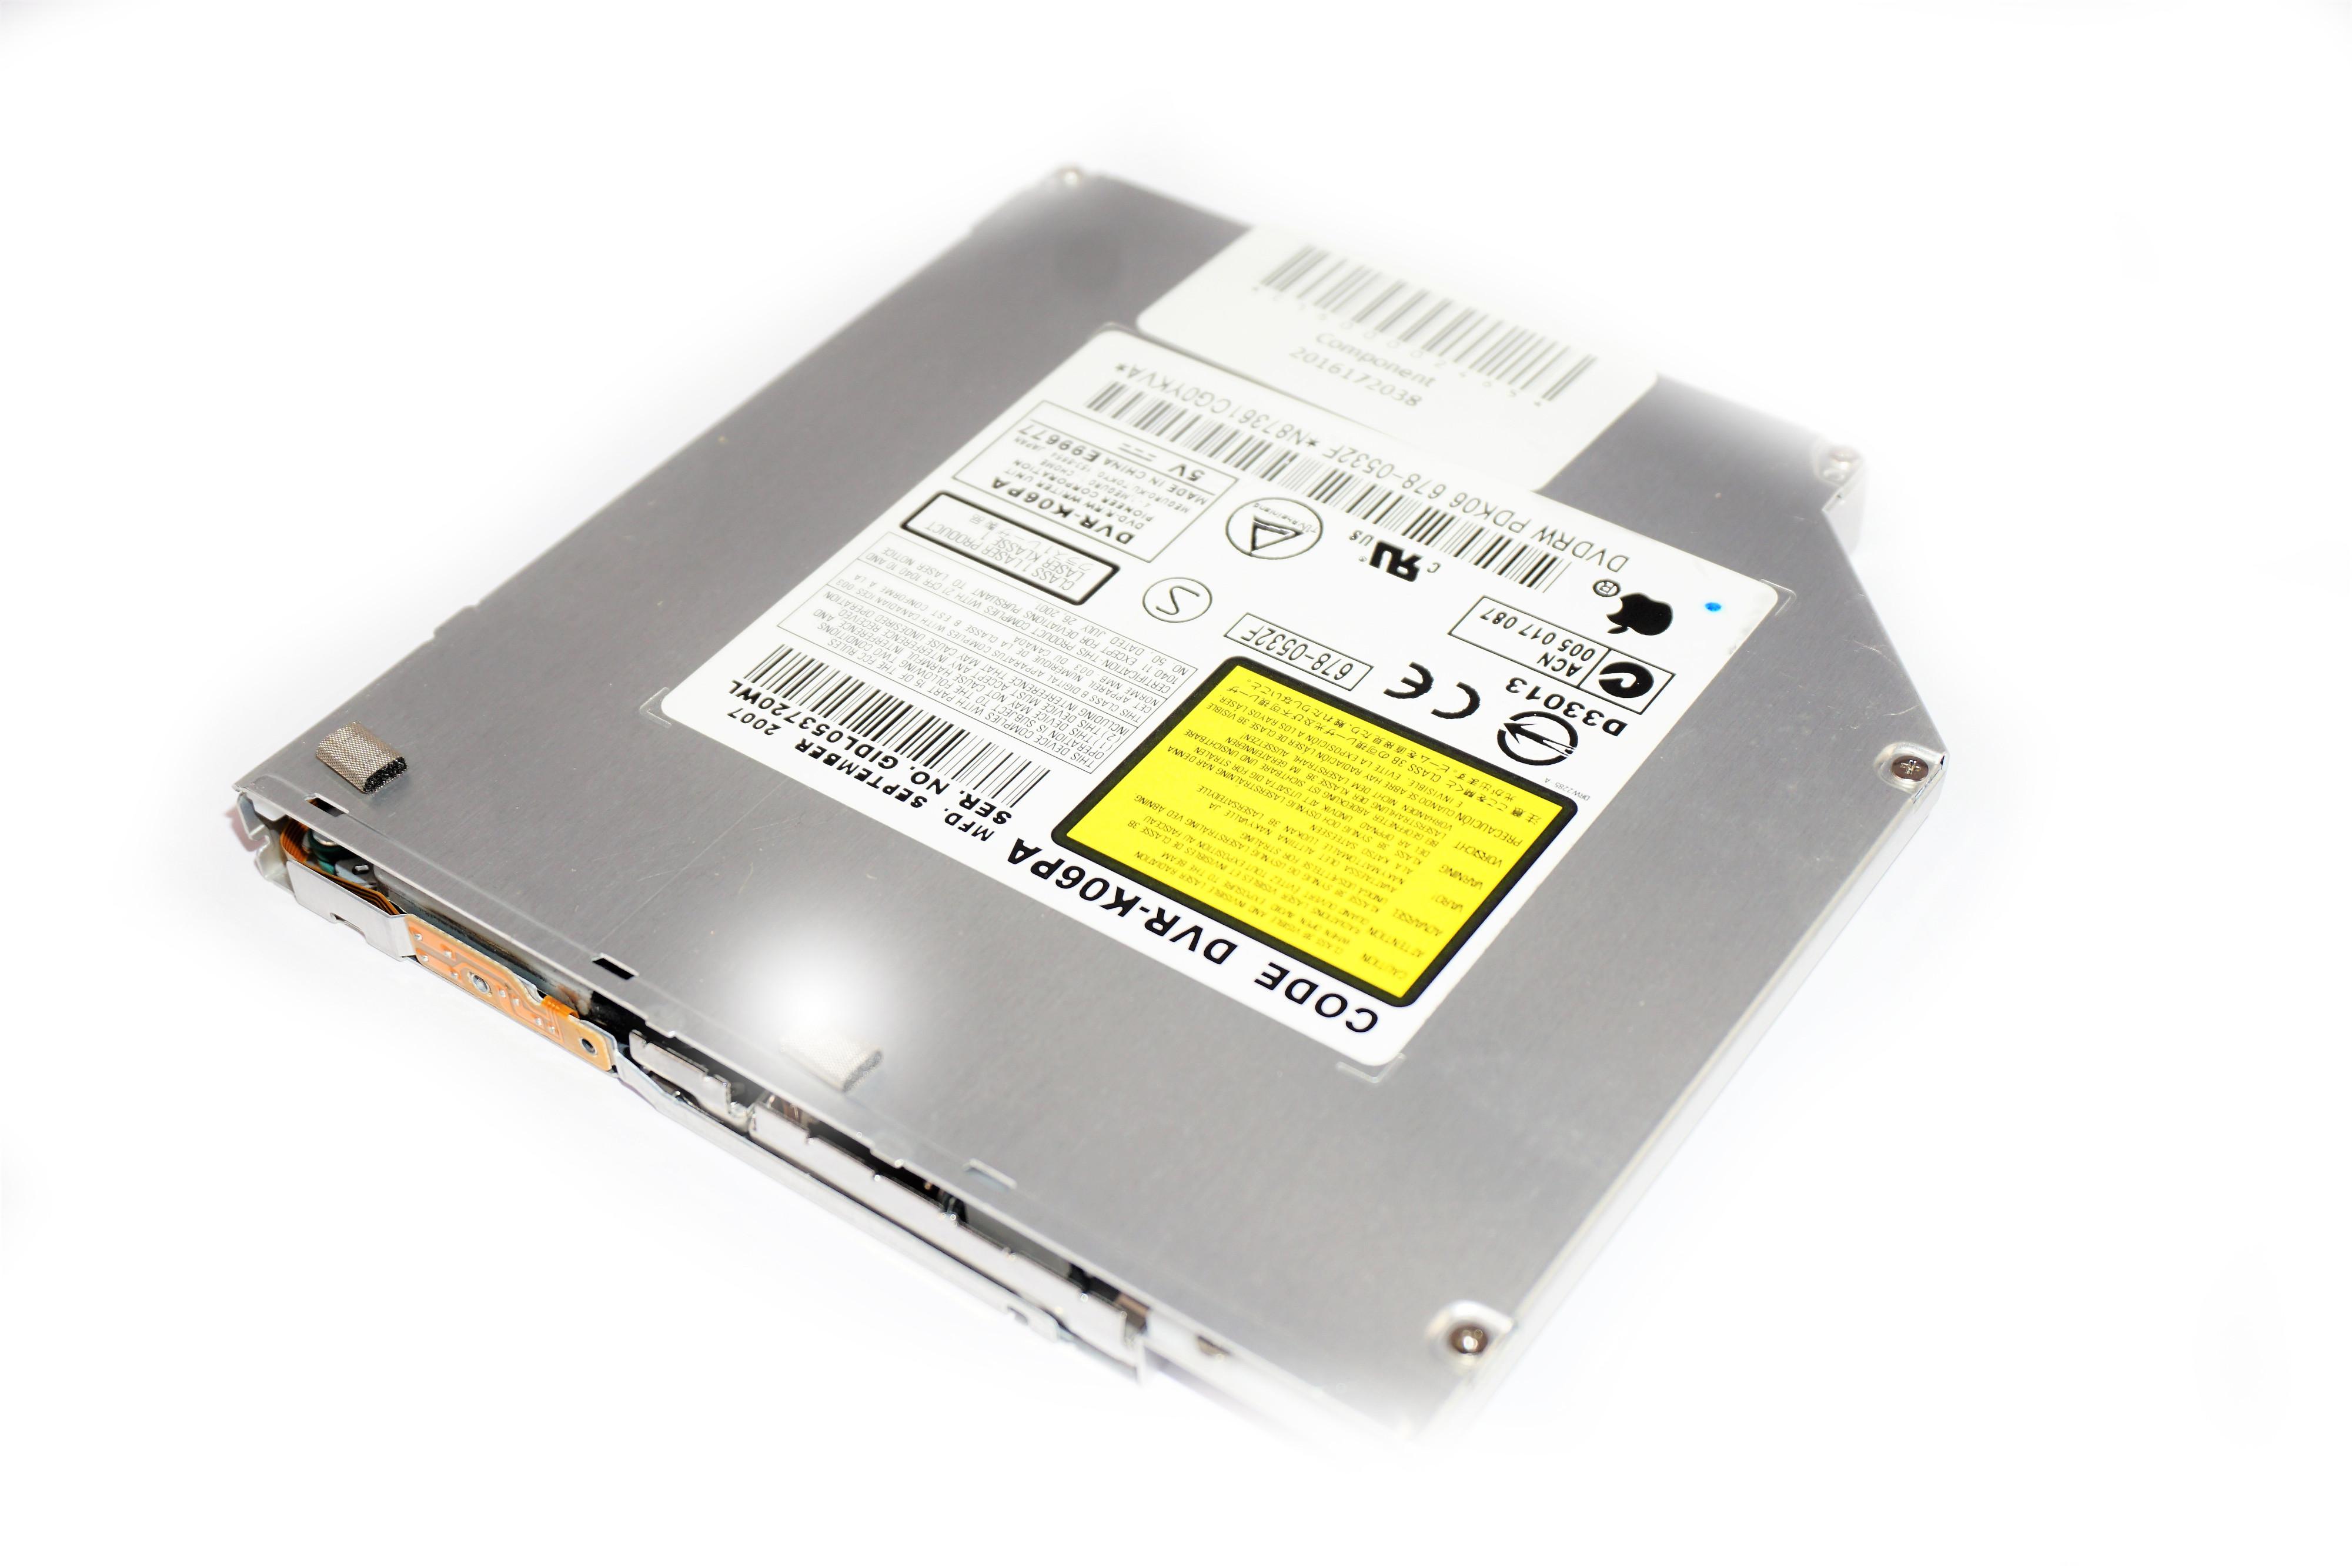 678-0532G Apple DVR-K06PA Optical Drive /f Mac Mini A1176 EMC:2108